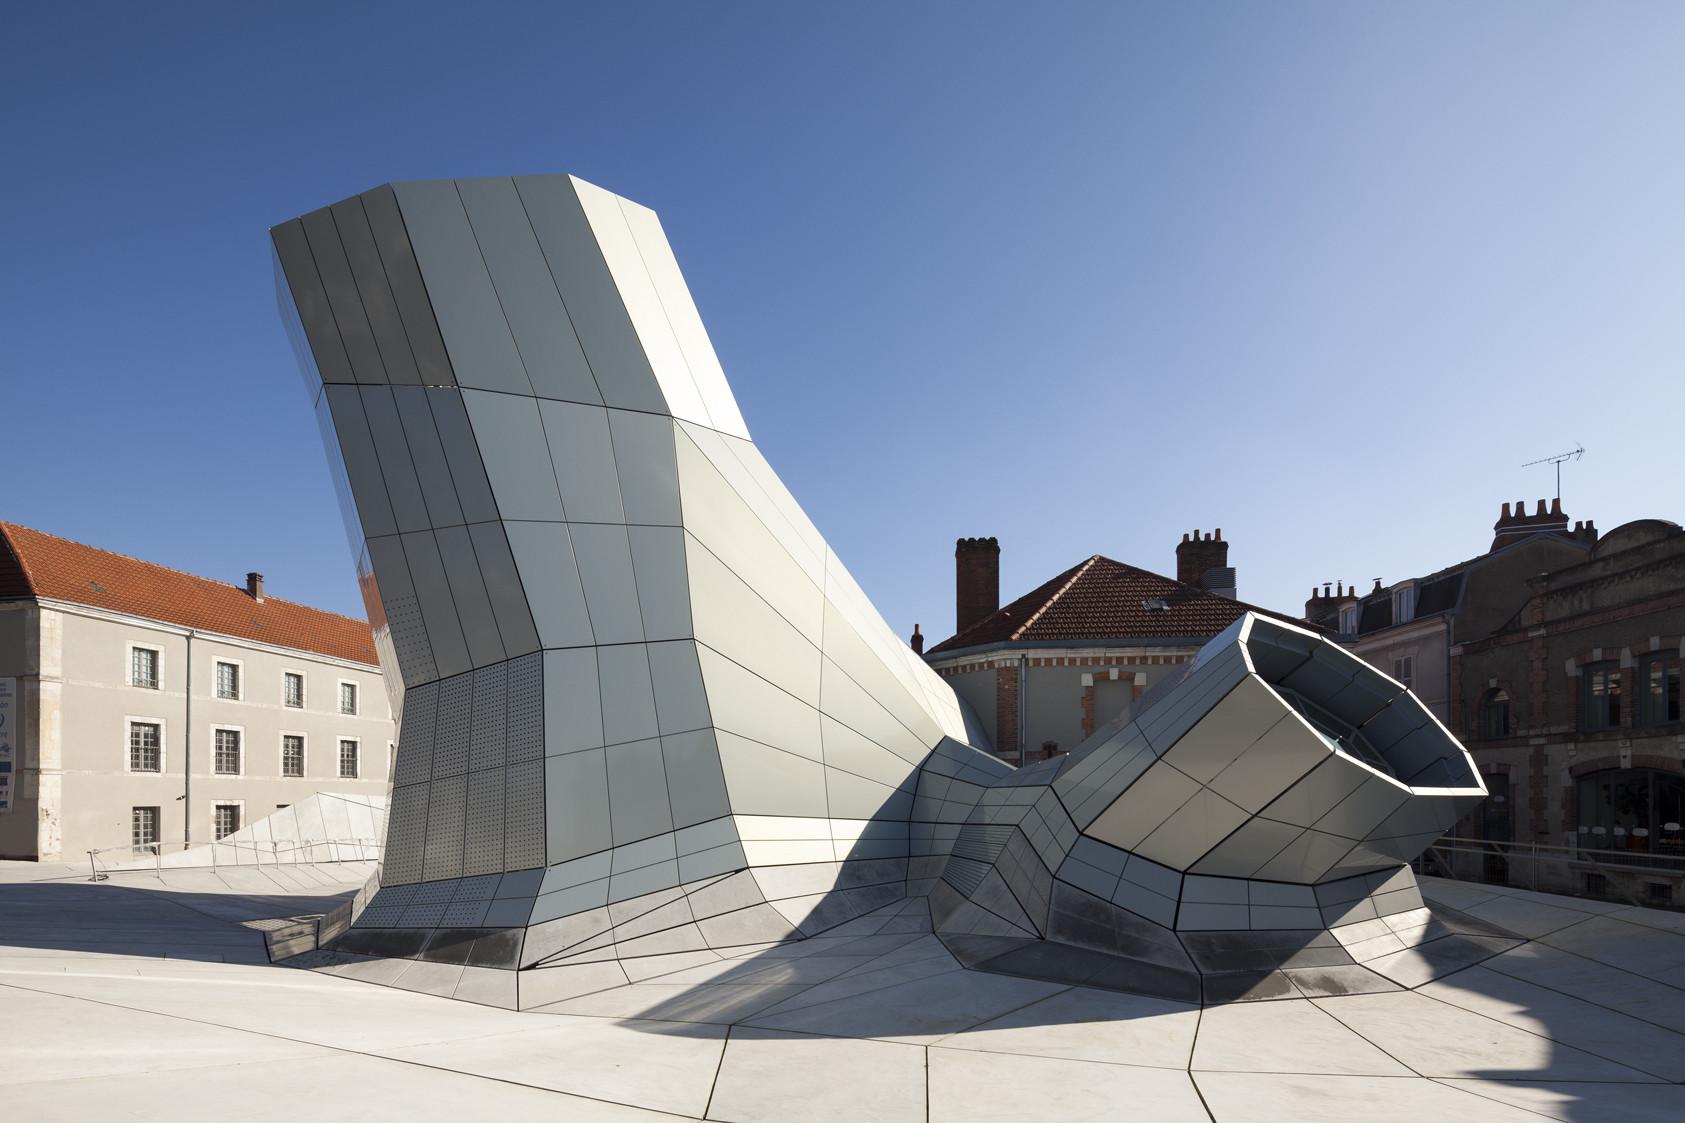 #3C5B8F The Turbulences FRAC Centre / Jakob   Macfarlane Architects © Nicolas  1416 Quanto Custa Uma Janela De Aluminio Com Vidro Duplo